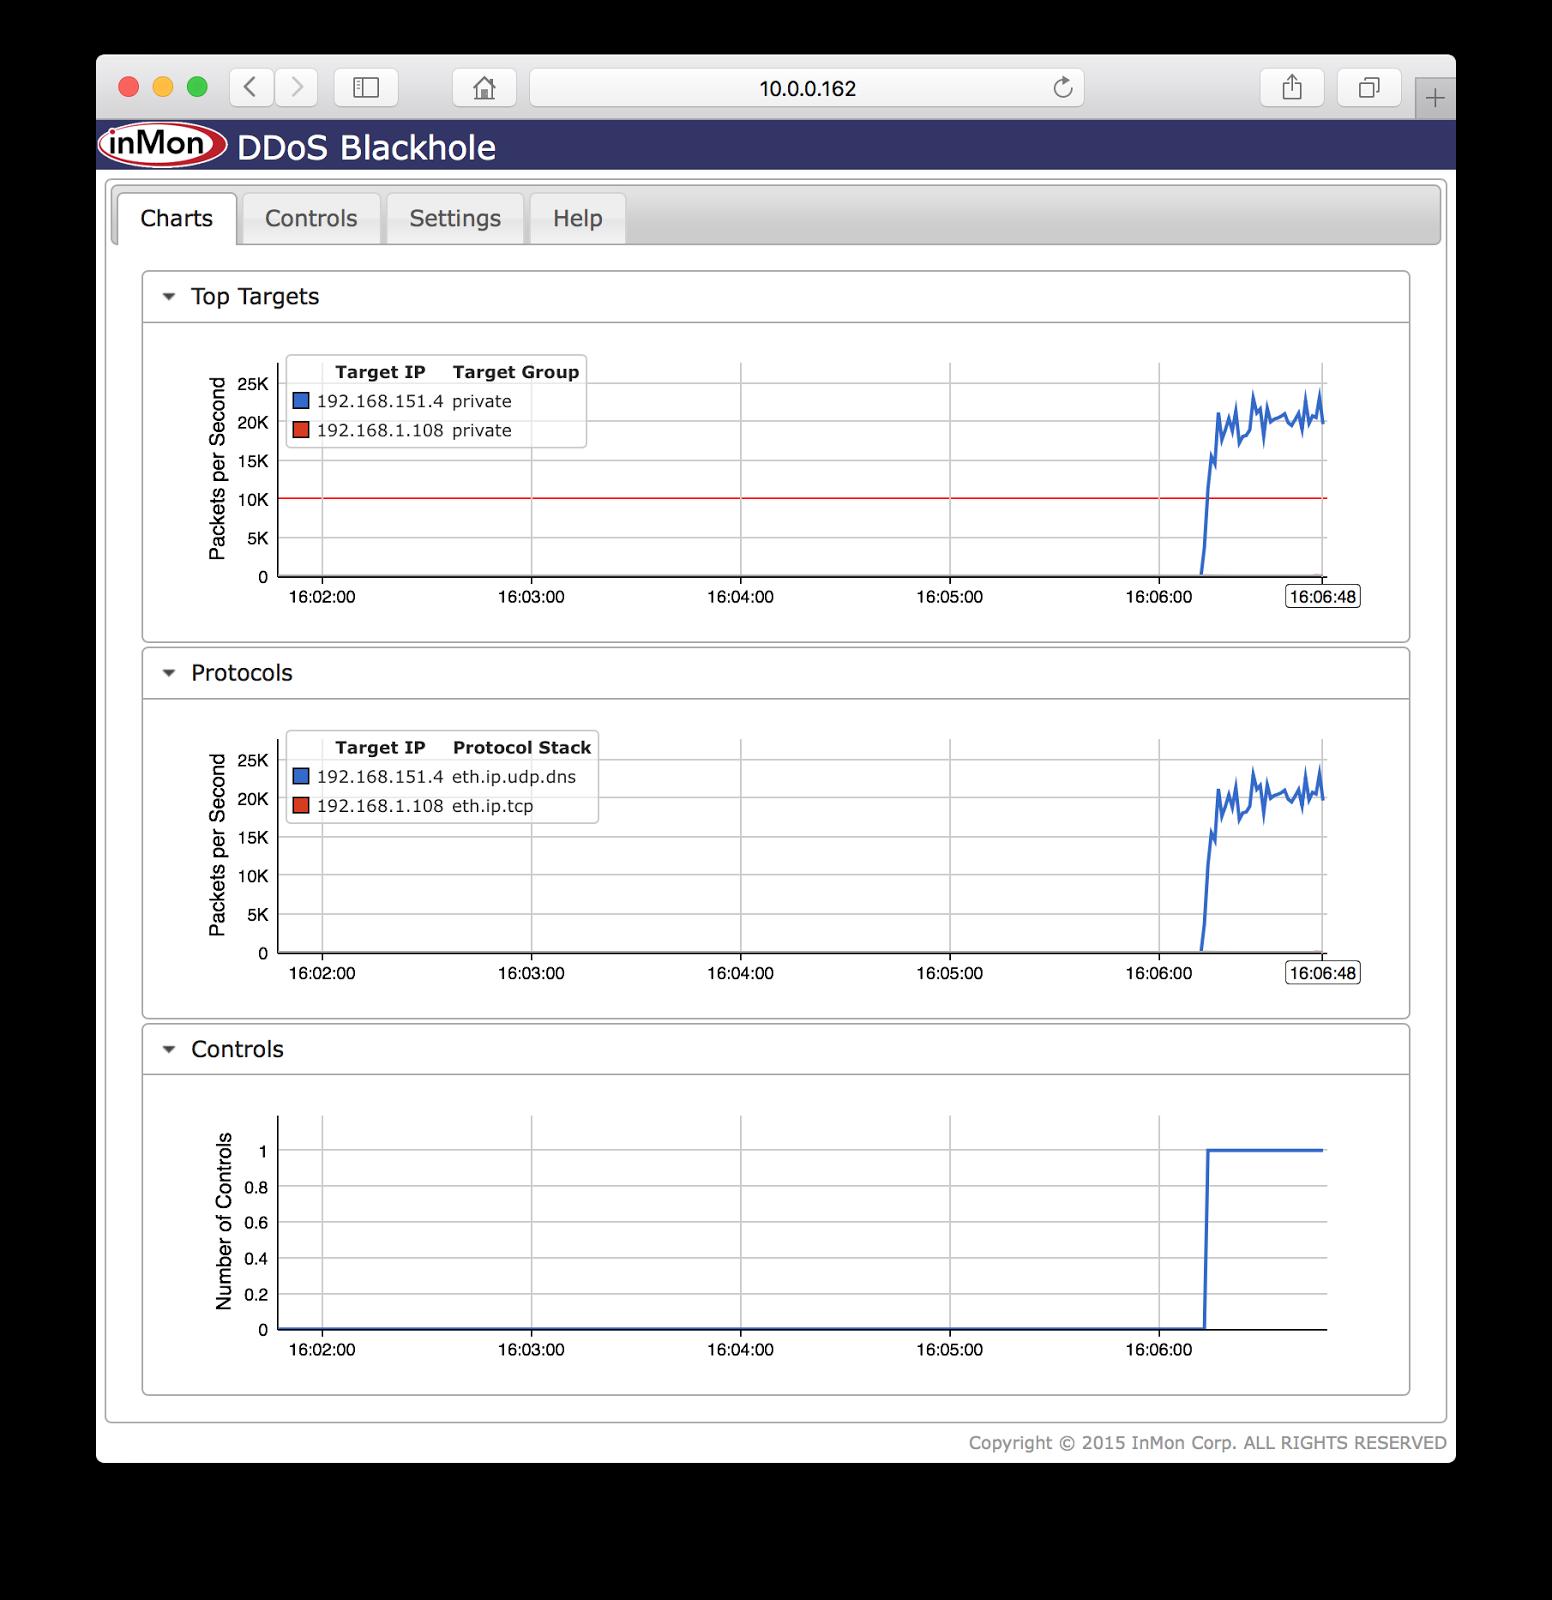 sFlow: DDoS Blackhole